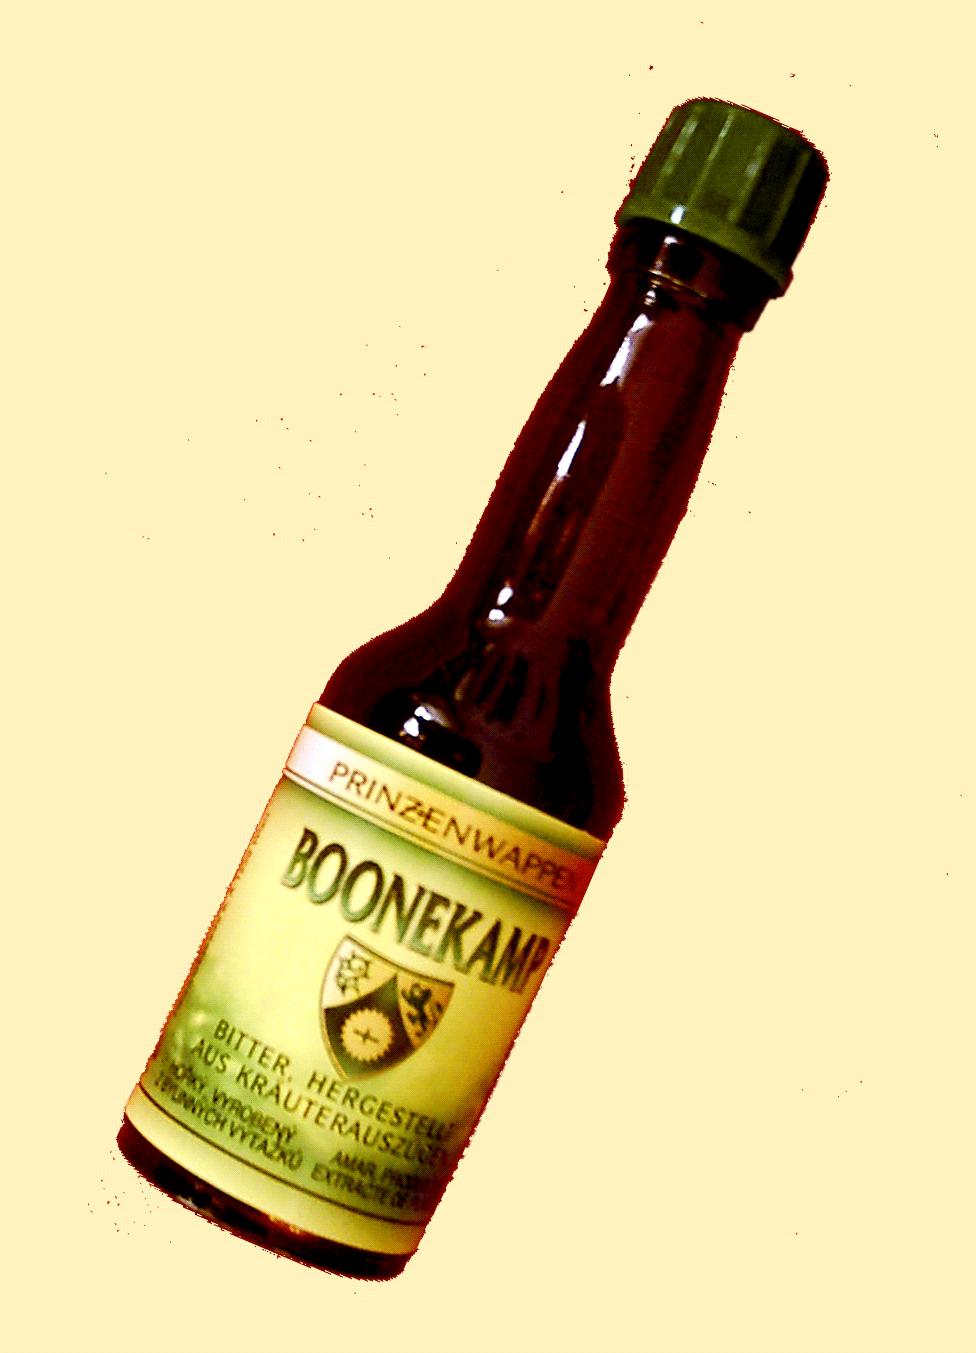 Boonekamp – Wikipedia